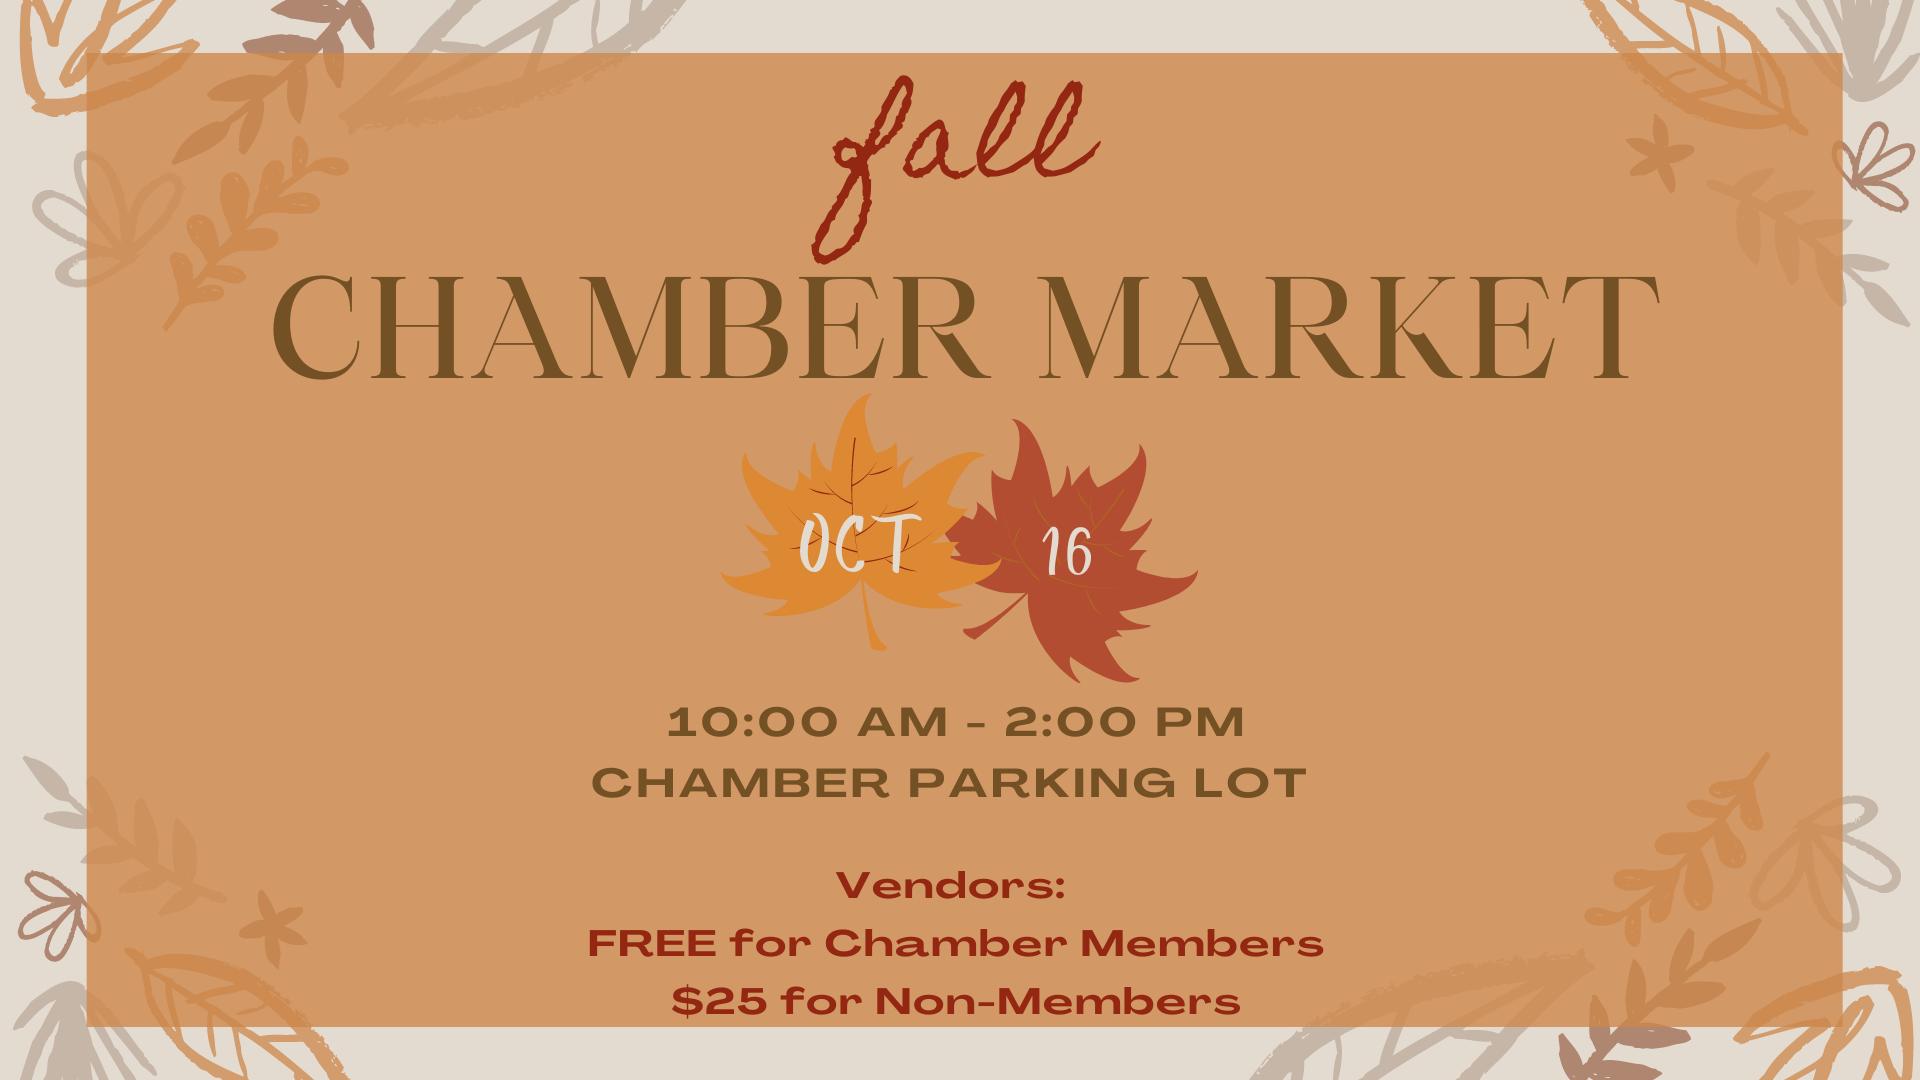 Fall Chamber Market FB